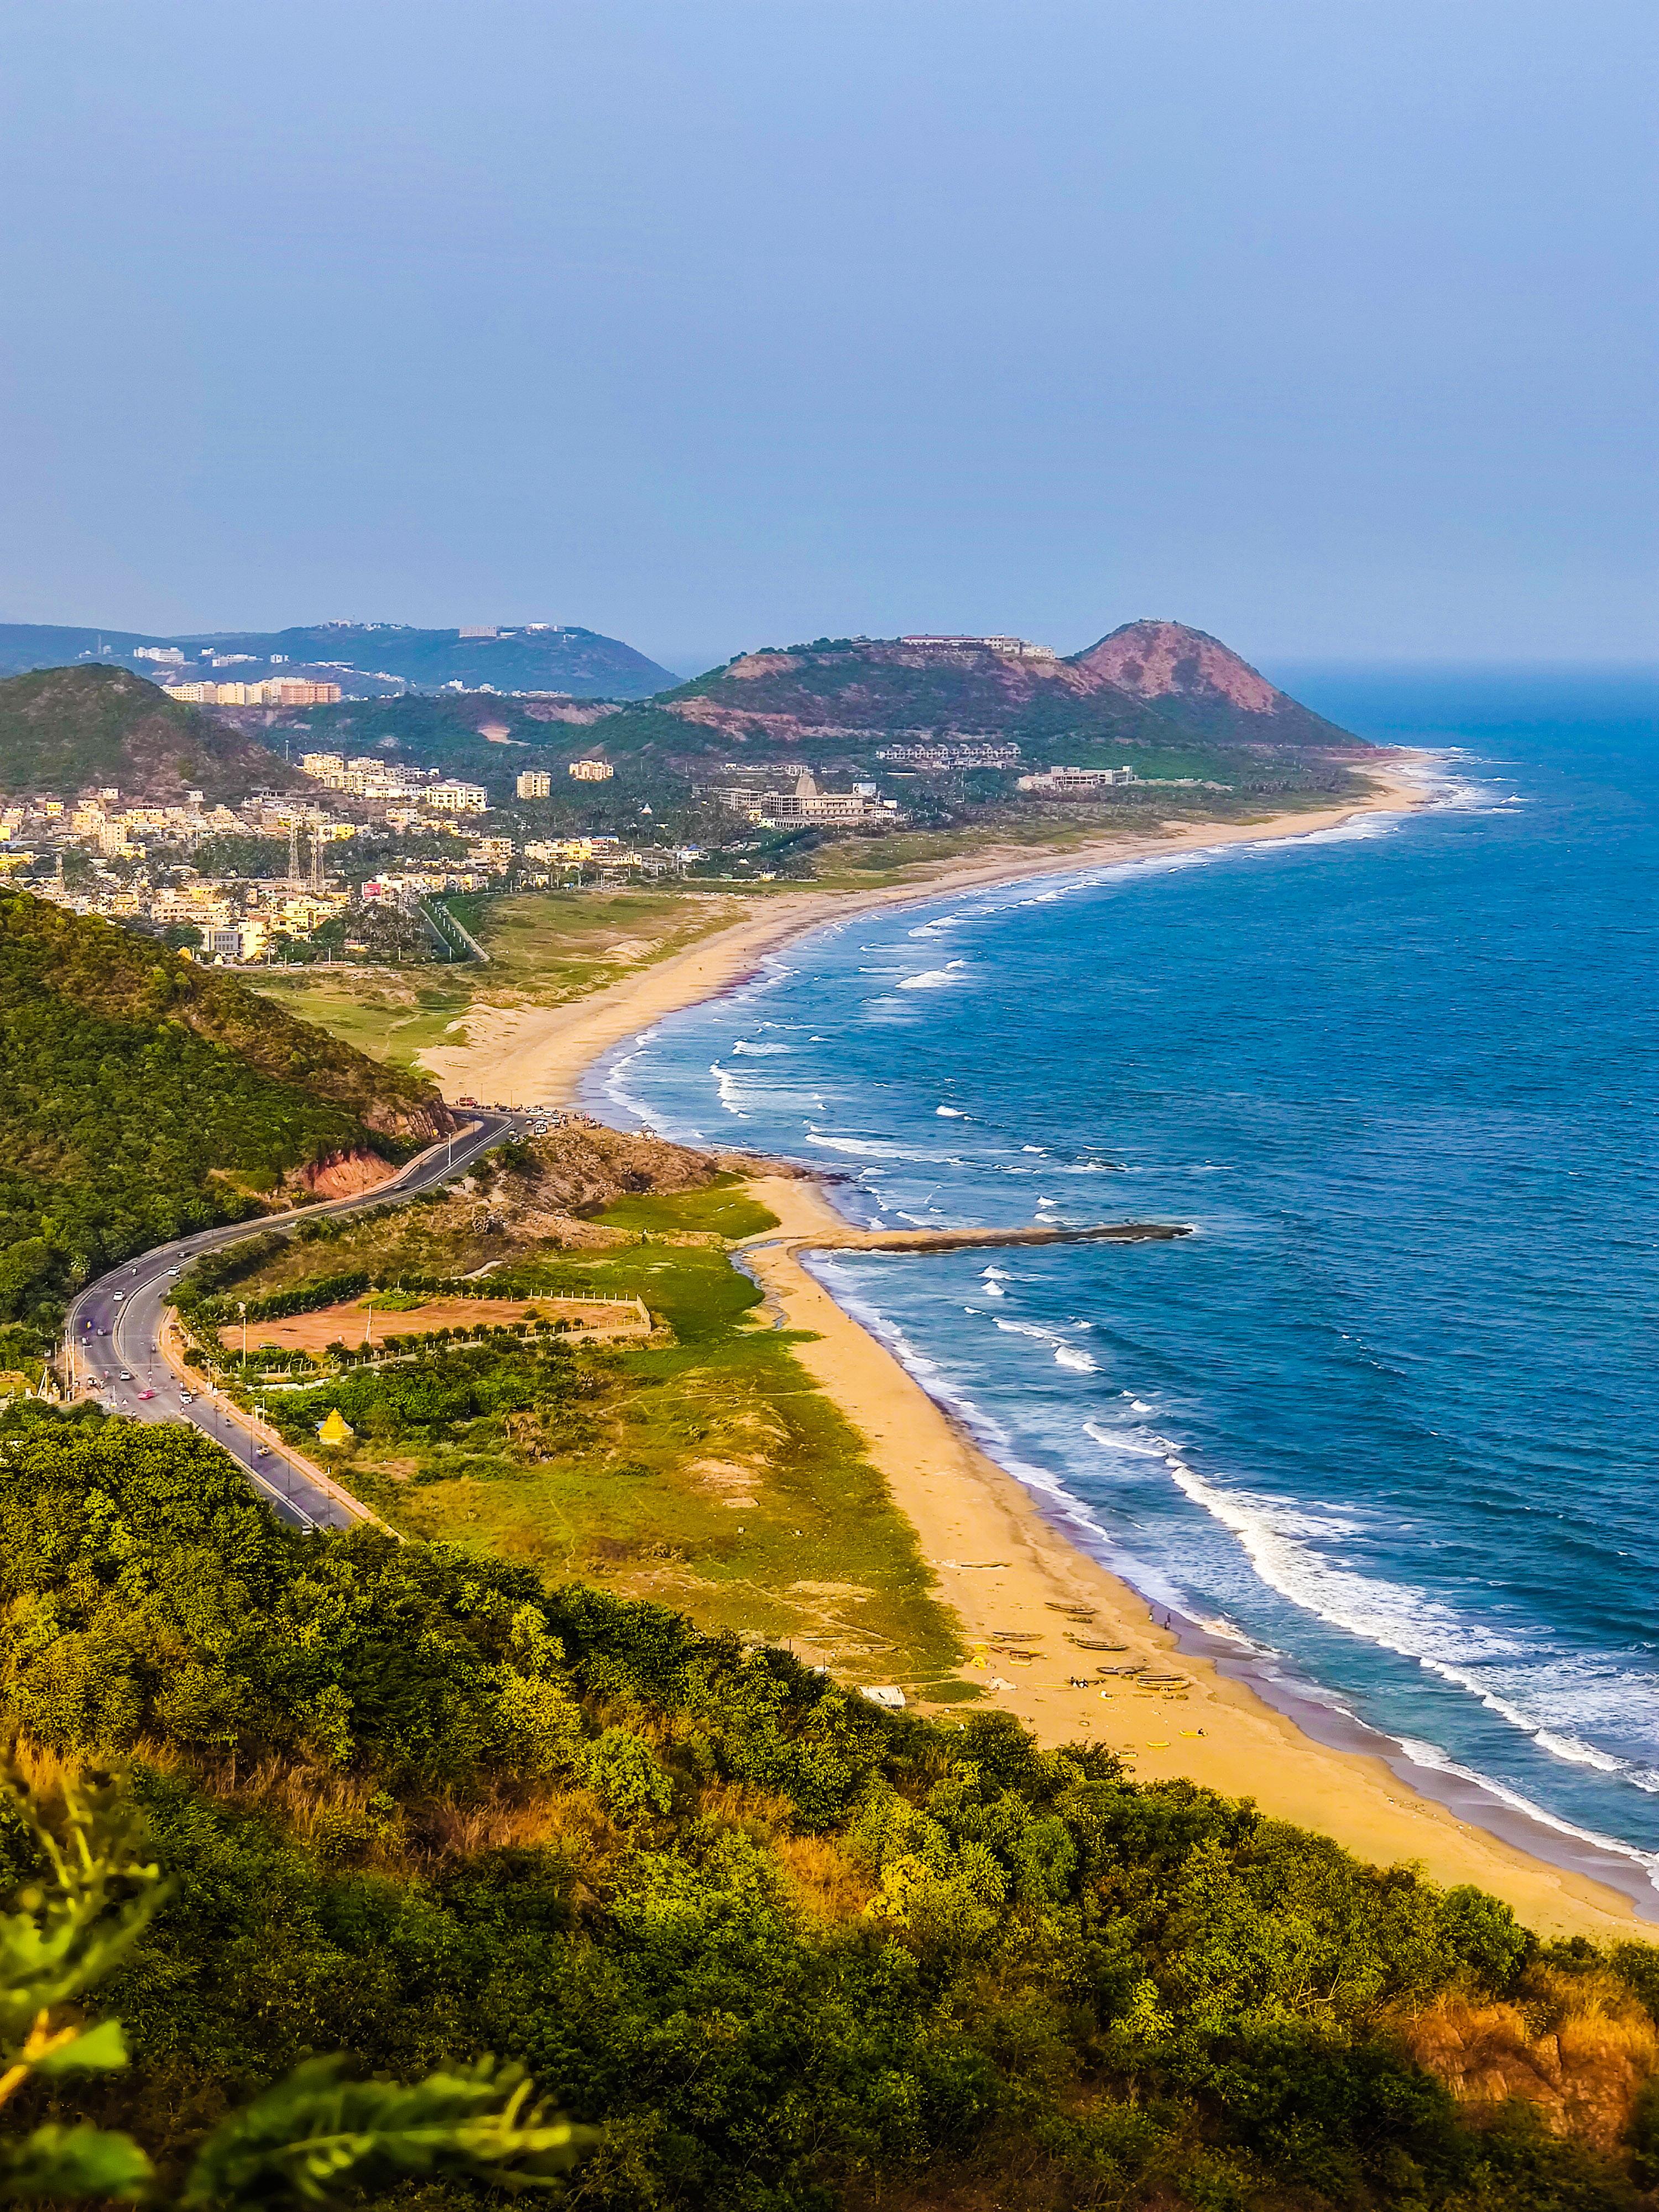 Beach Road Visakhapatnam Wikipedia